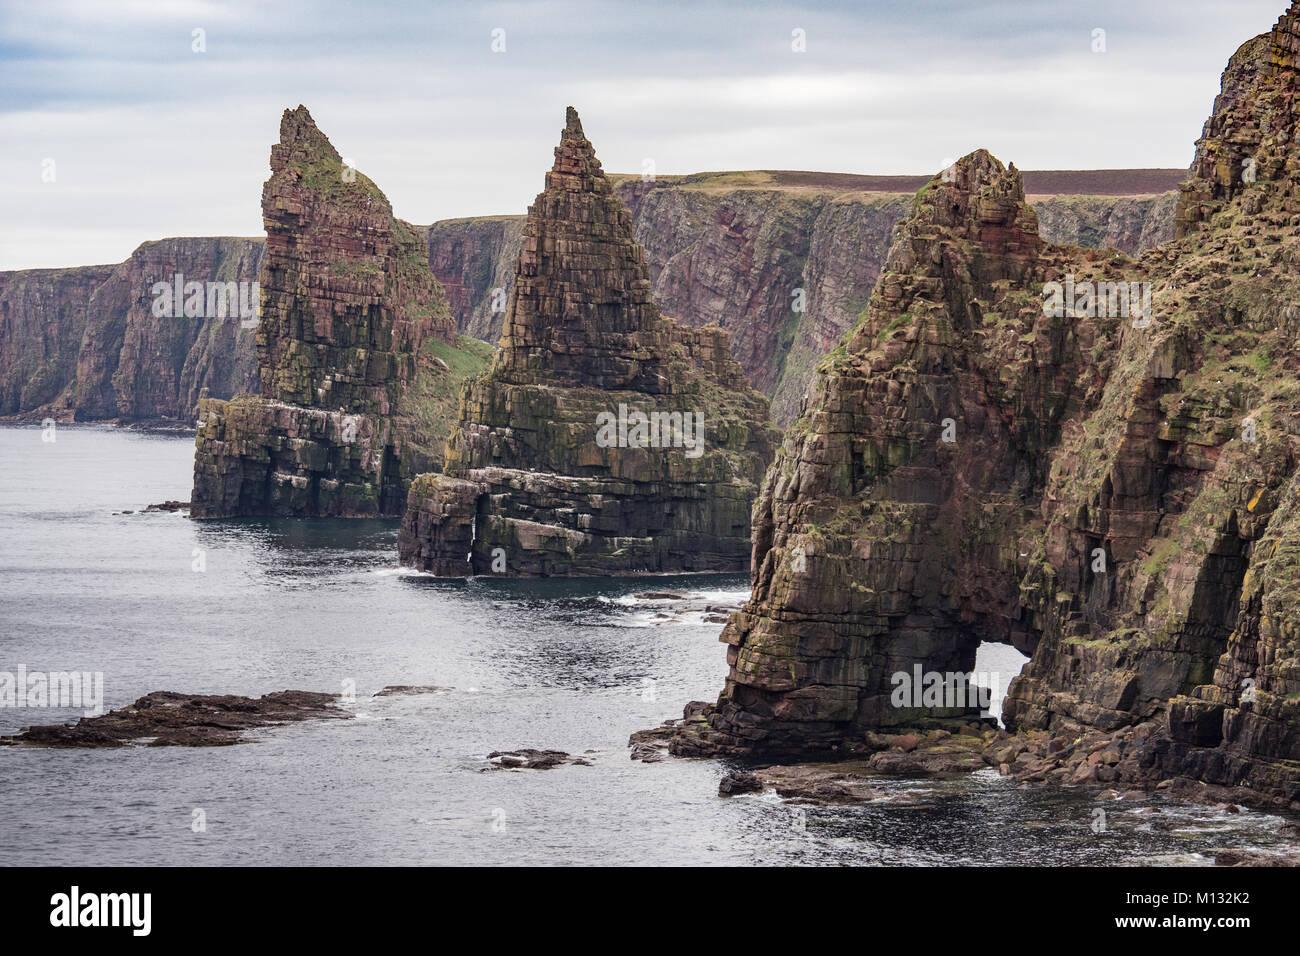 Duncansby Head Sea Stacks near John O'Groats, Caithness, Scotland. UK. - Stock Image